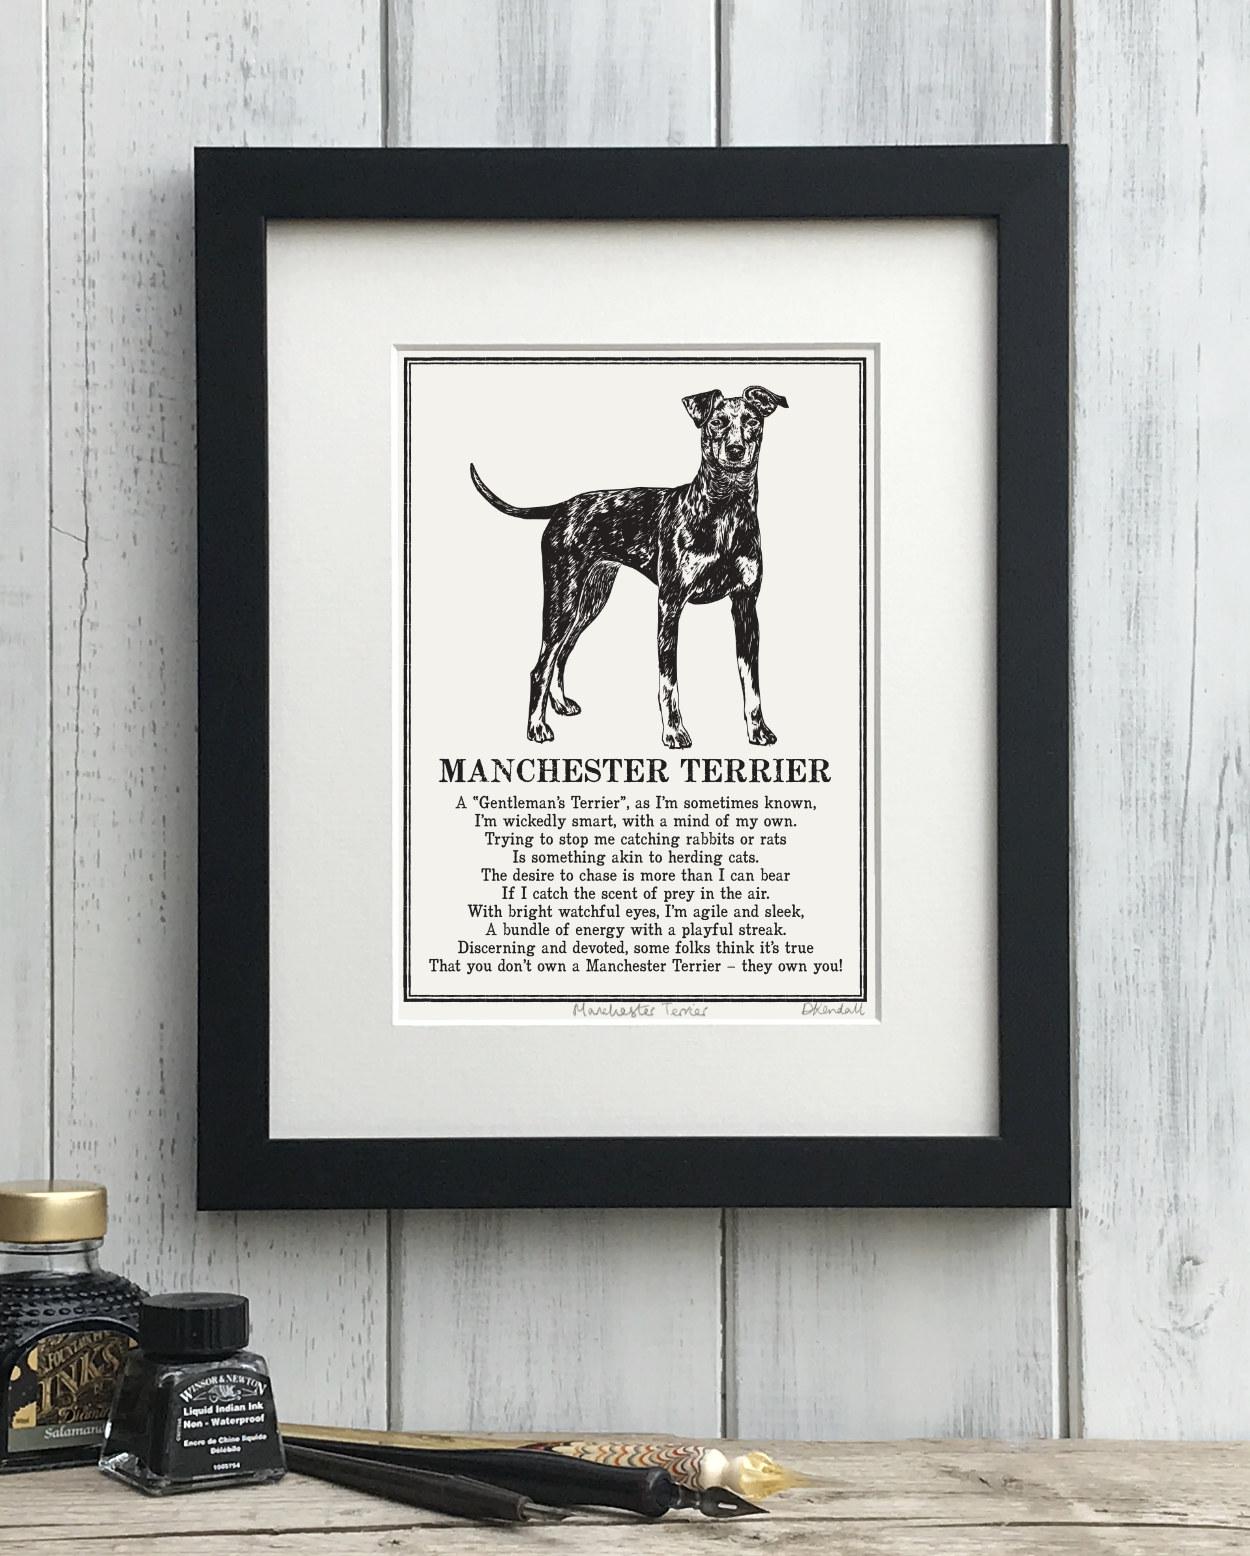 Manchester Terrier Doggerel Illustrated Poem Art Print | The Enlightened Hound